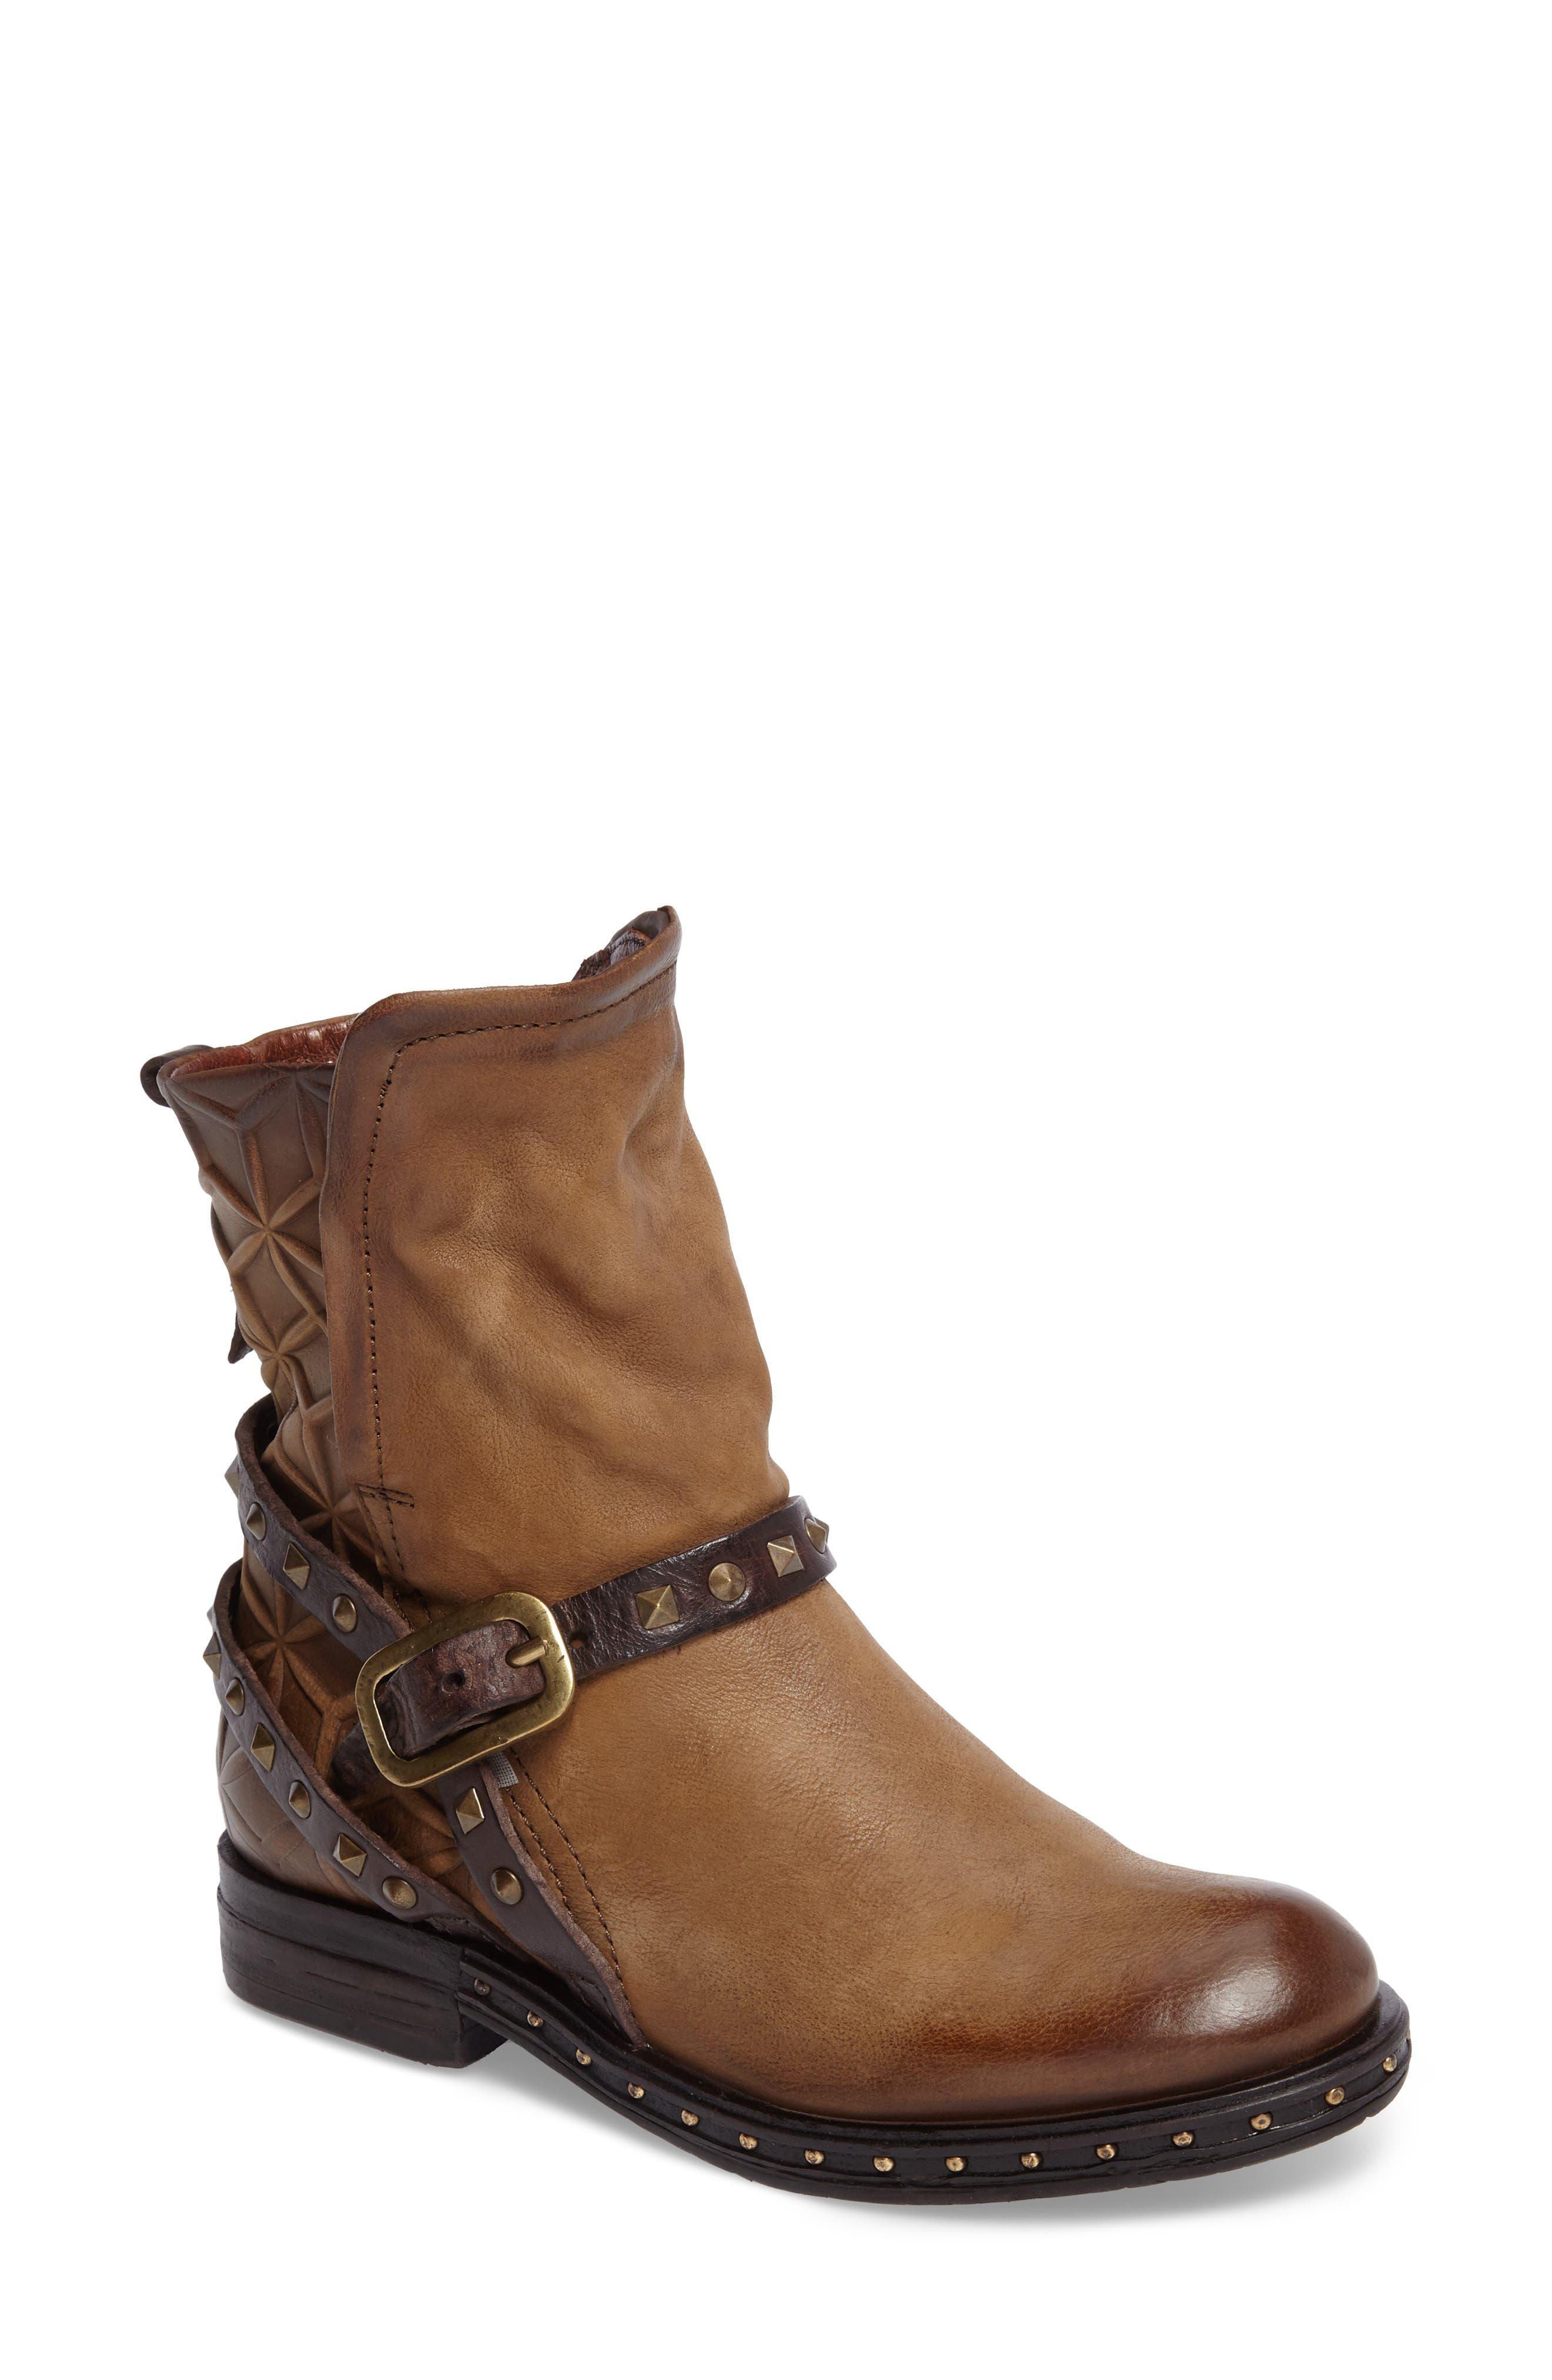 Alternate Image 1 Selected - A.S. 98 Slash Boot (Women)